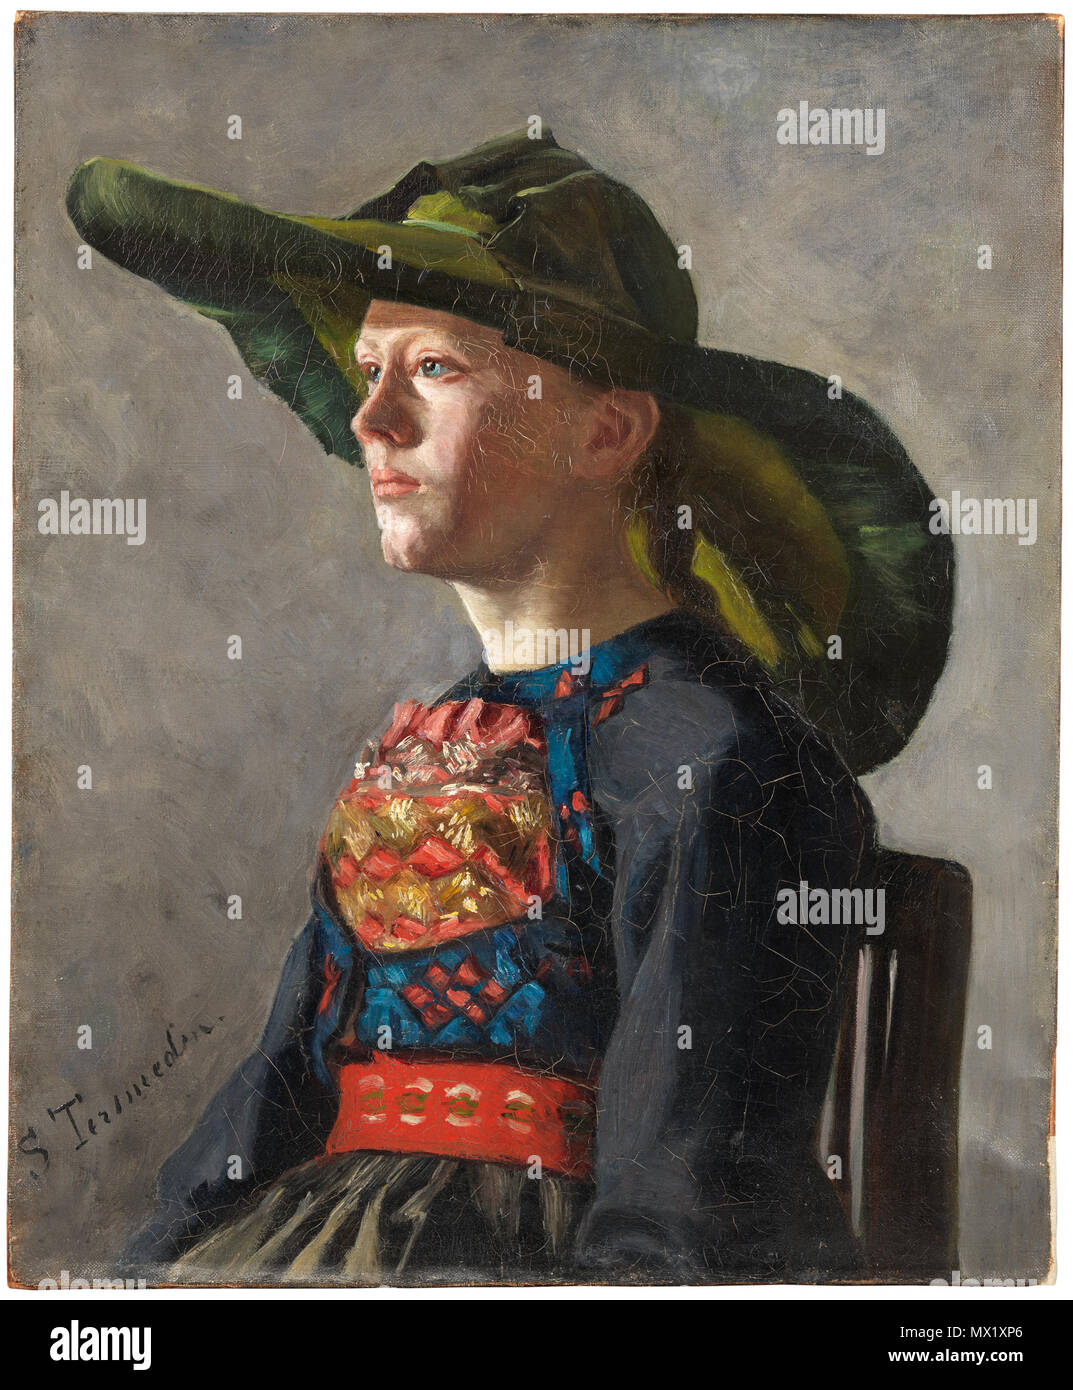 .  English: Bavarian Peasant Girl Svenska: Bayersk bondflicka  . Unknown date 77 Bavarian Peasant Girl (Selima Tersmeden) - Nationalmuseum - 211313 Stock Photo